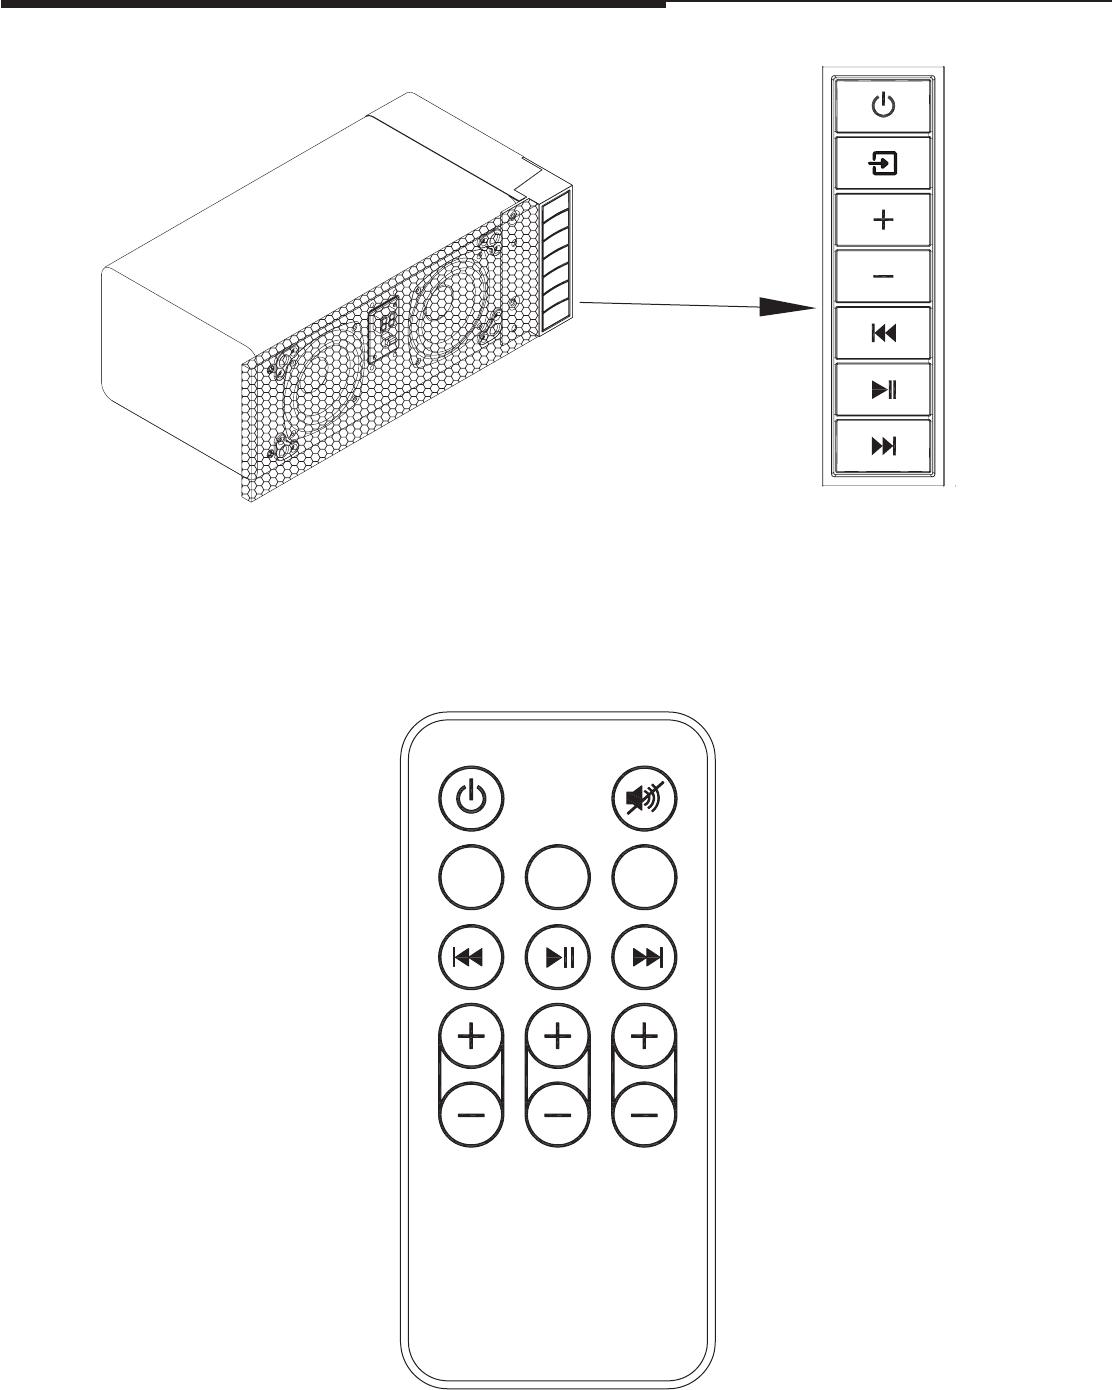 Twin Star TS-1206 SOUND SYSTEM User Manual Manual